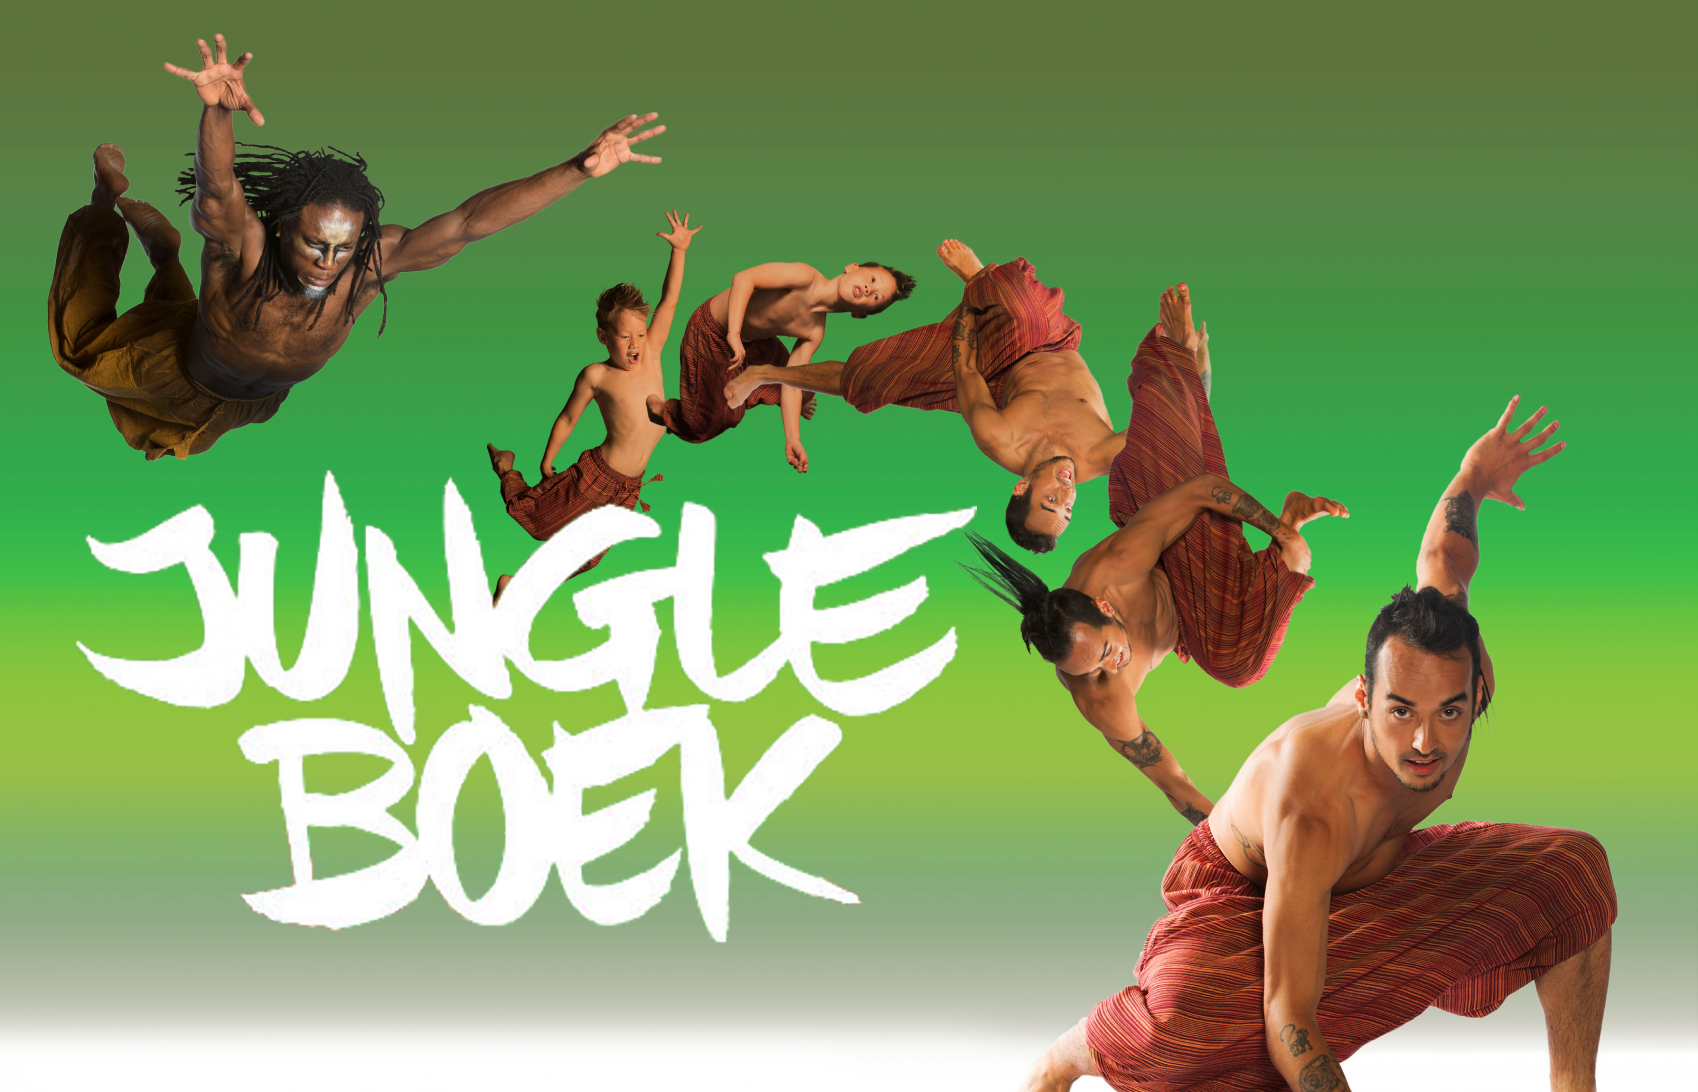 Jungleboek - The making of… _235